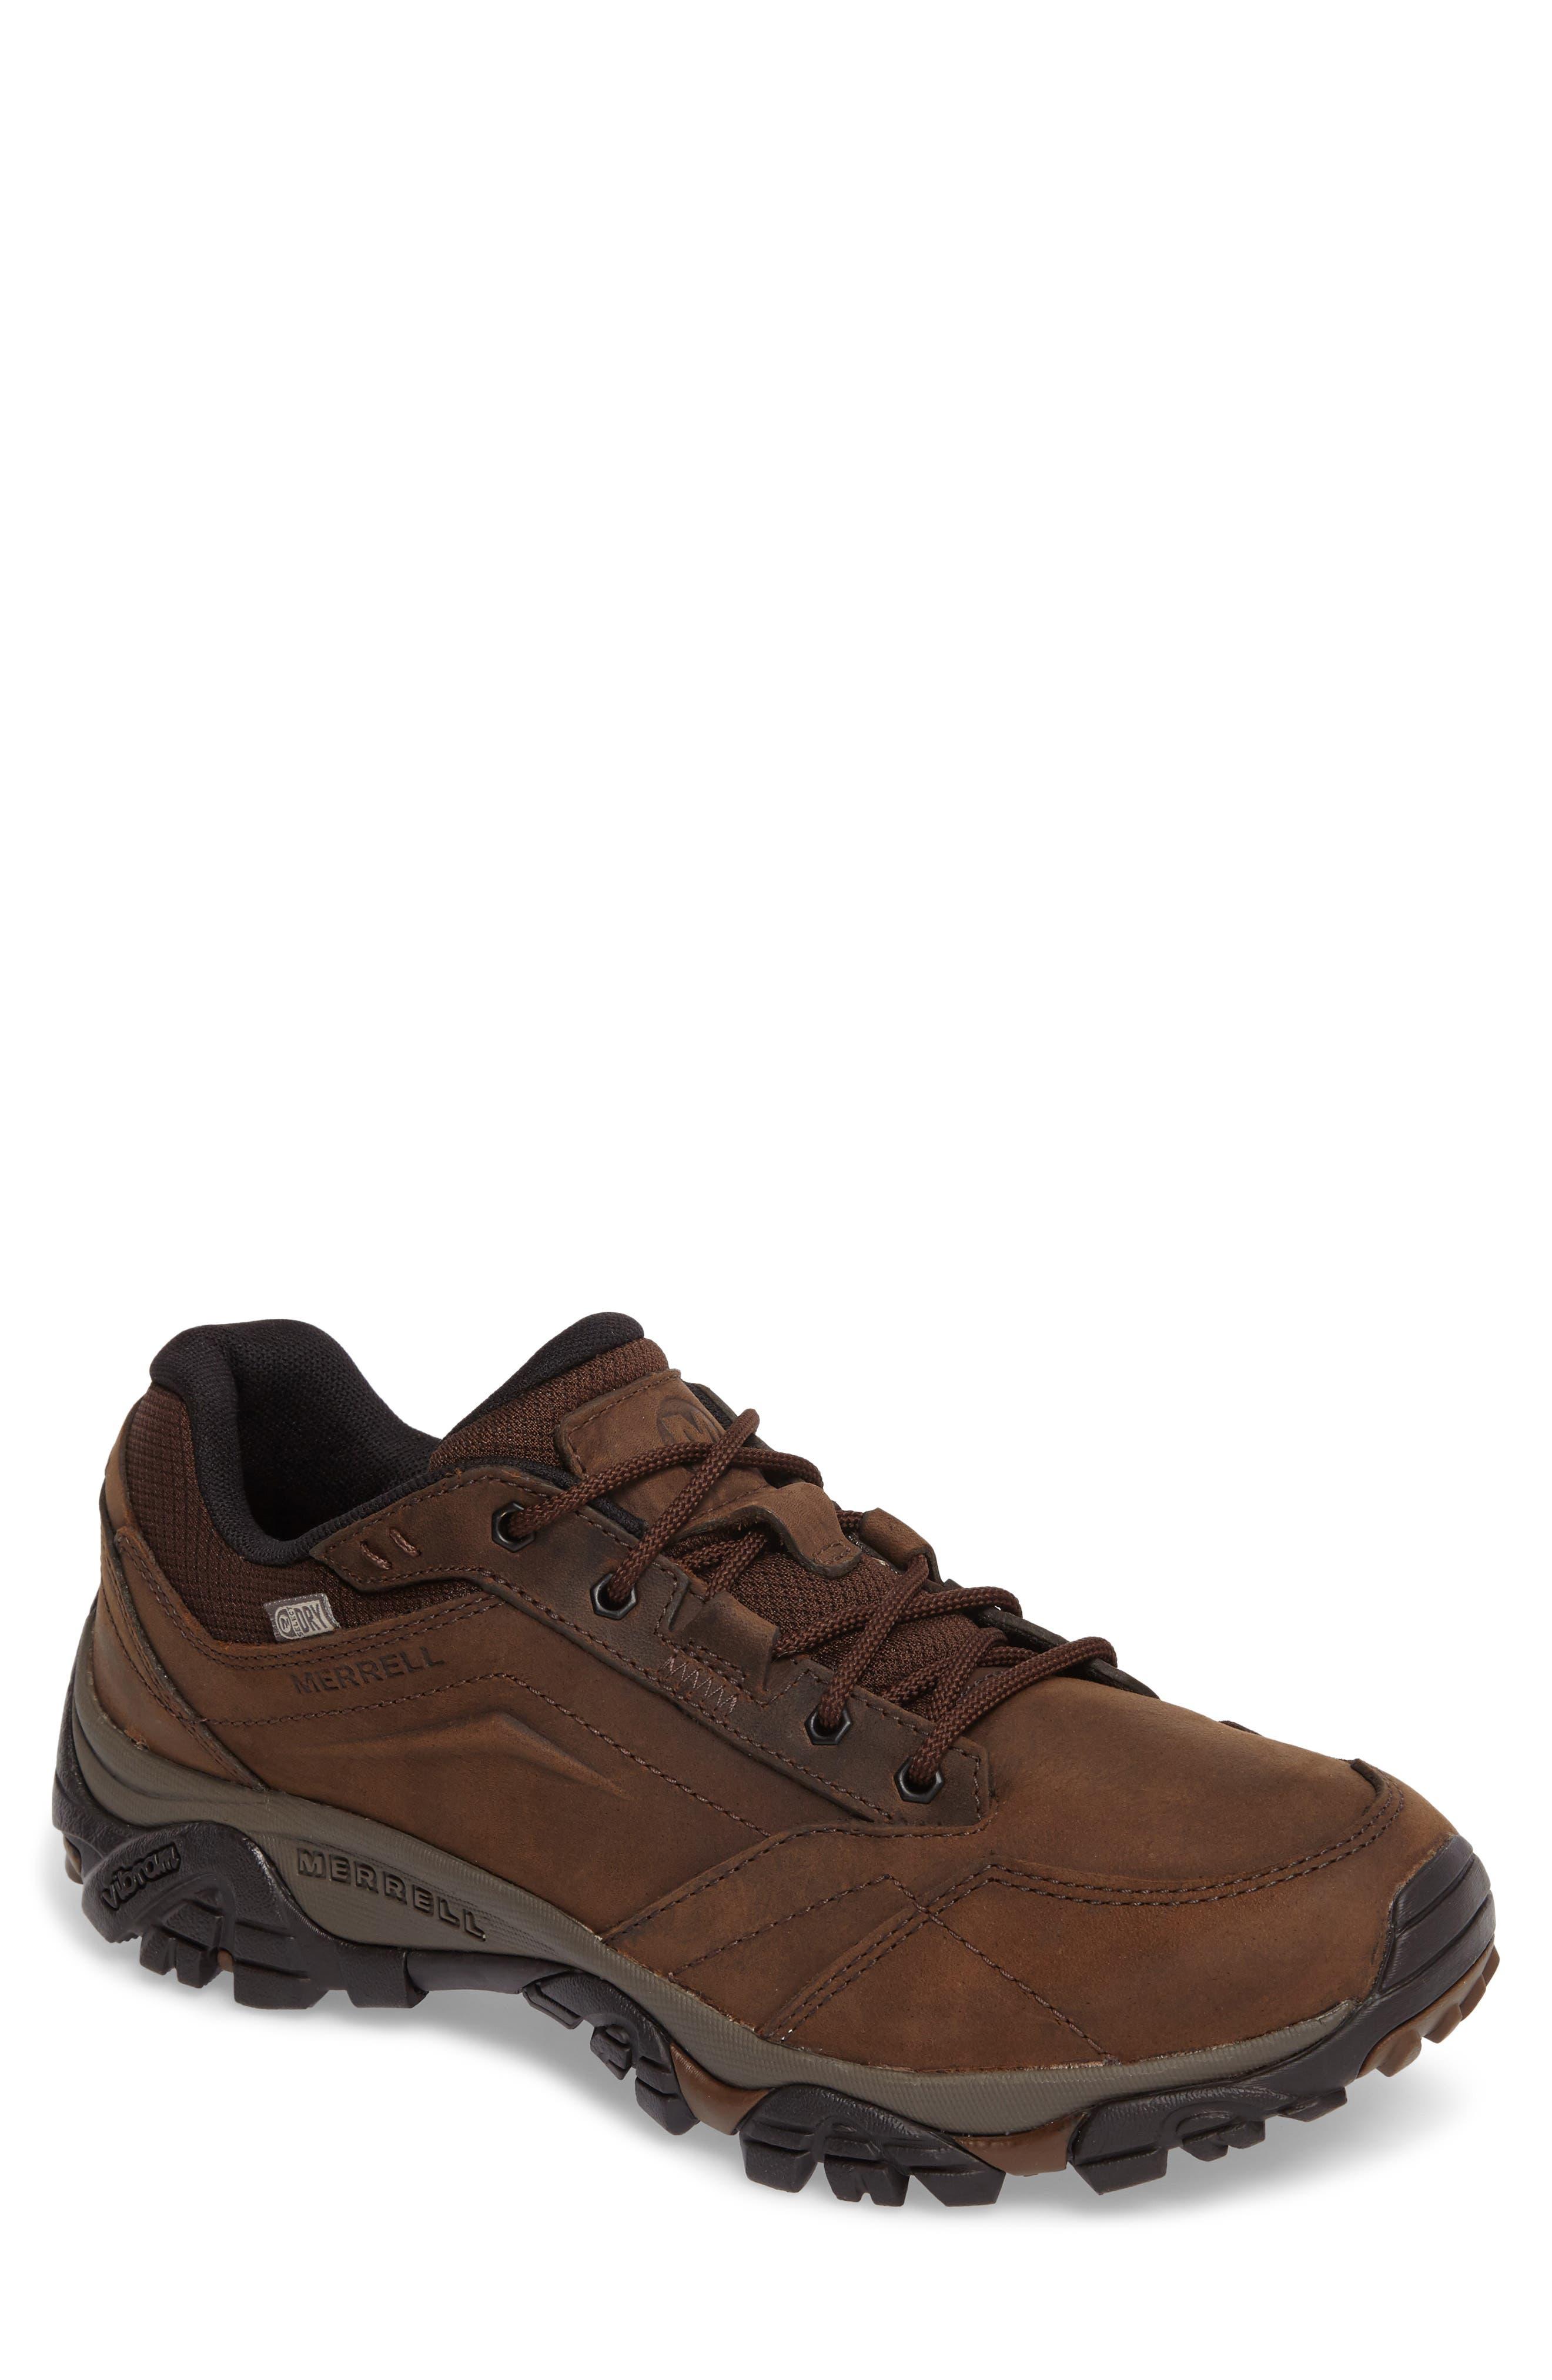 Moab Adventure Hiking Shoe,                         Main,                         color, Dark Earth Nubuck Leather